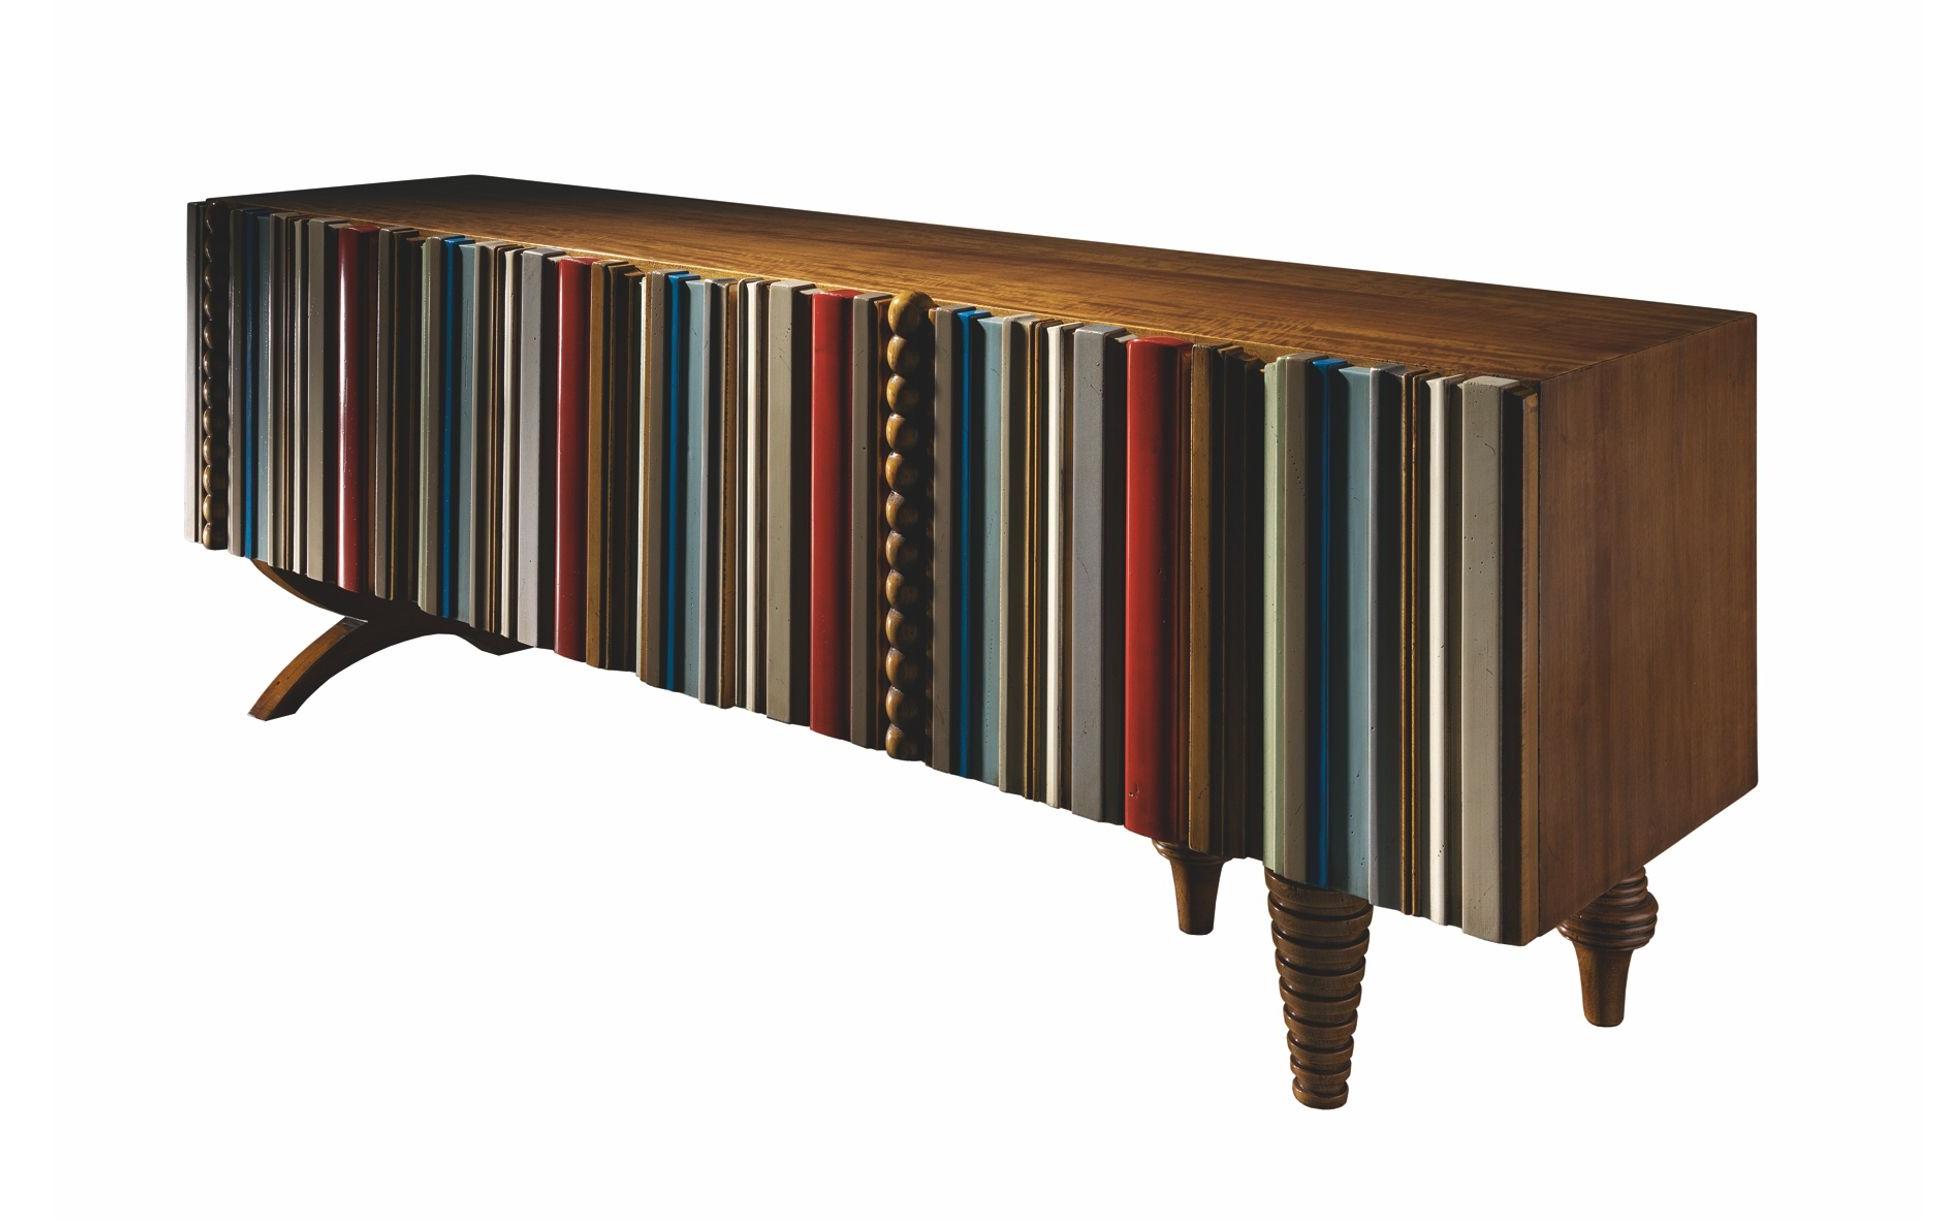 Reina: Mueble Funcional Y Versátil: Aparador Bajo O Mueble Pertaining To Lola Sideboards (View 13 of 20)